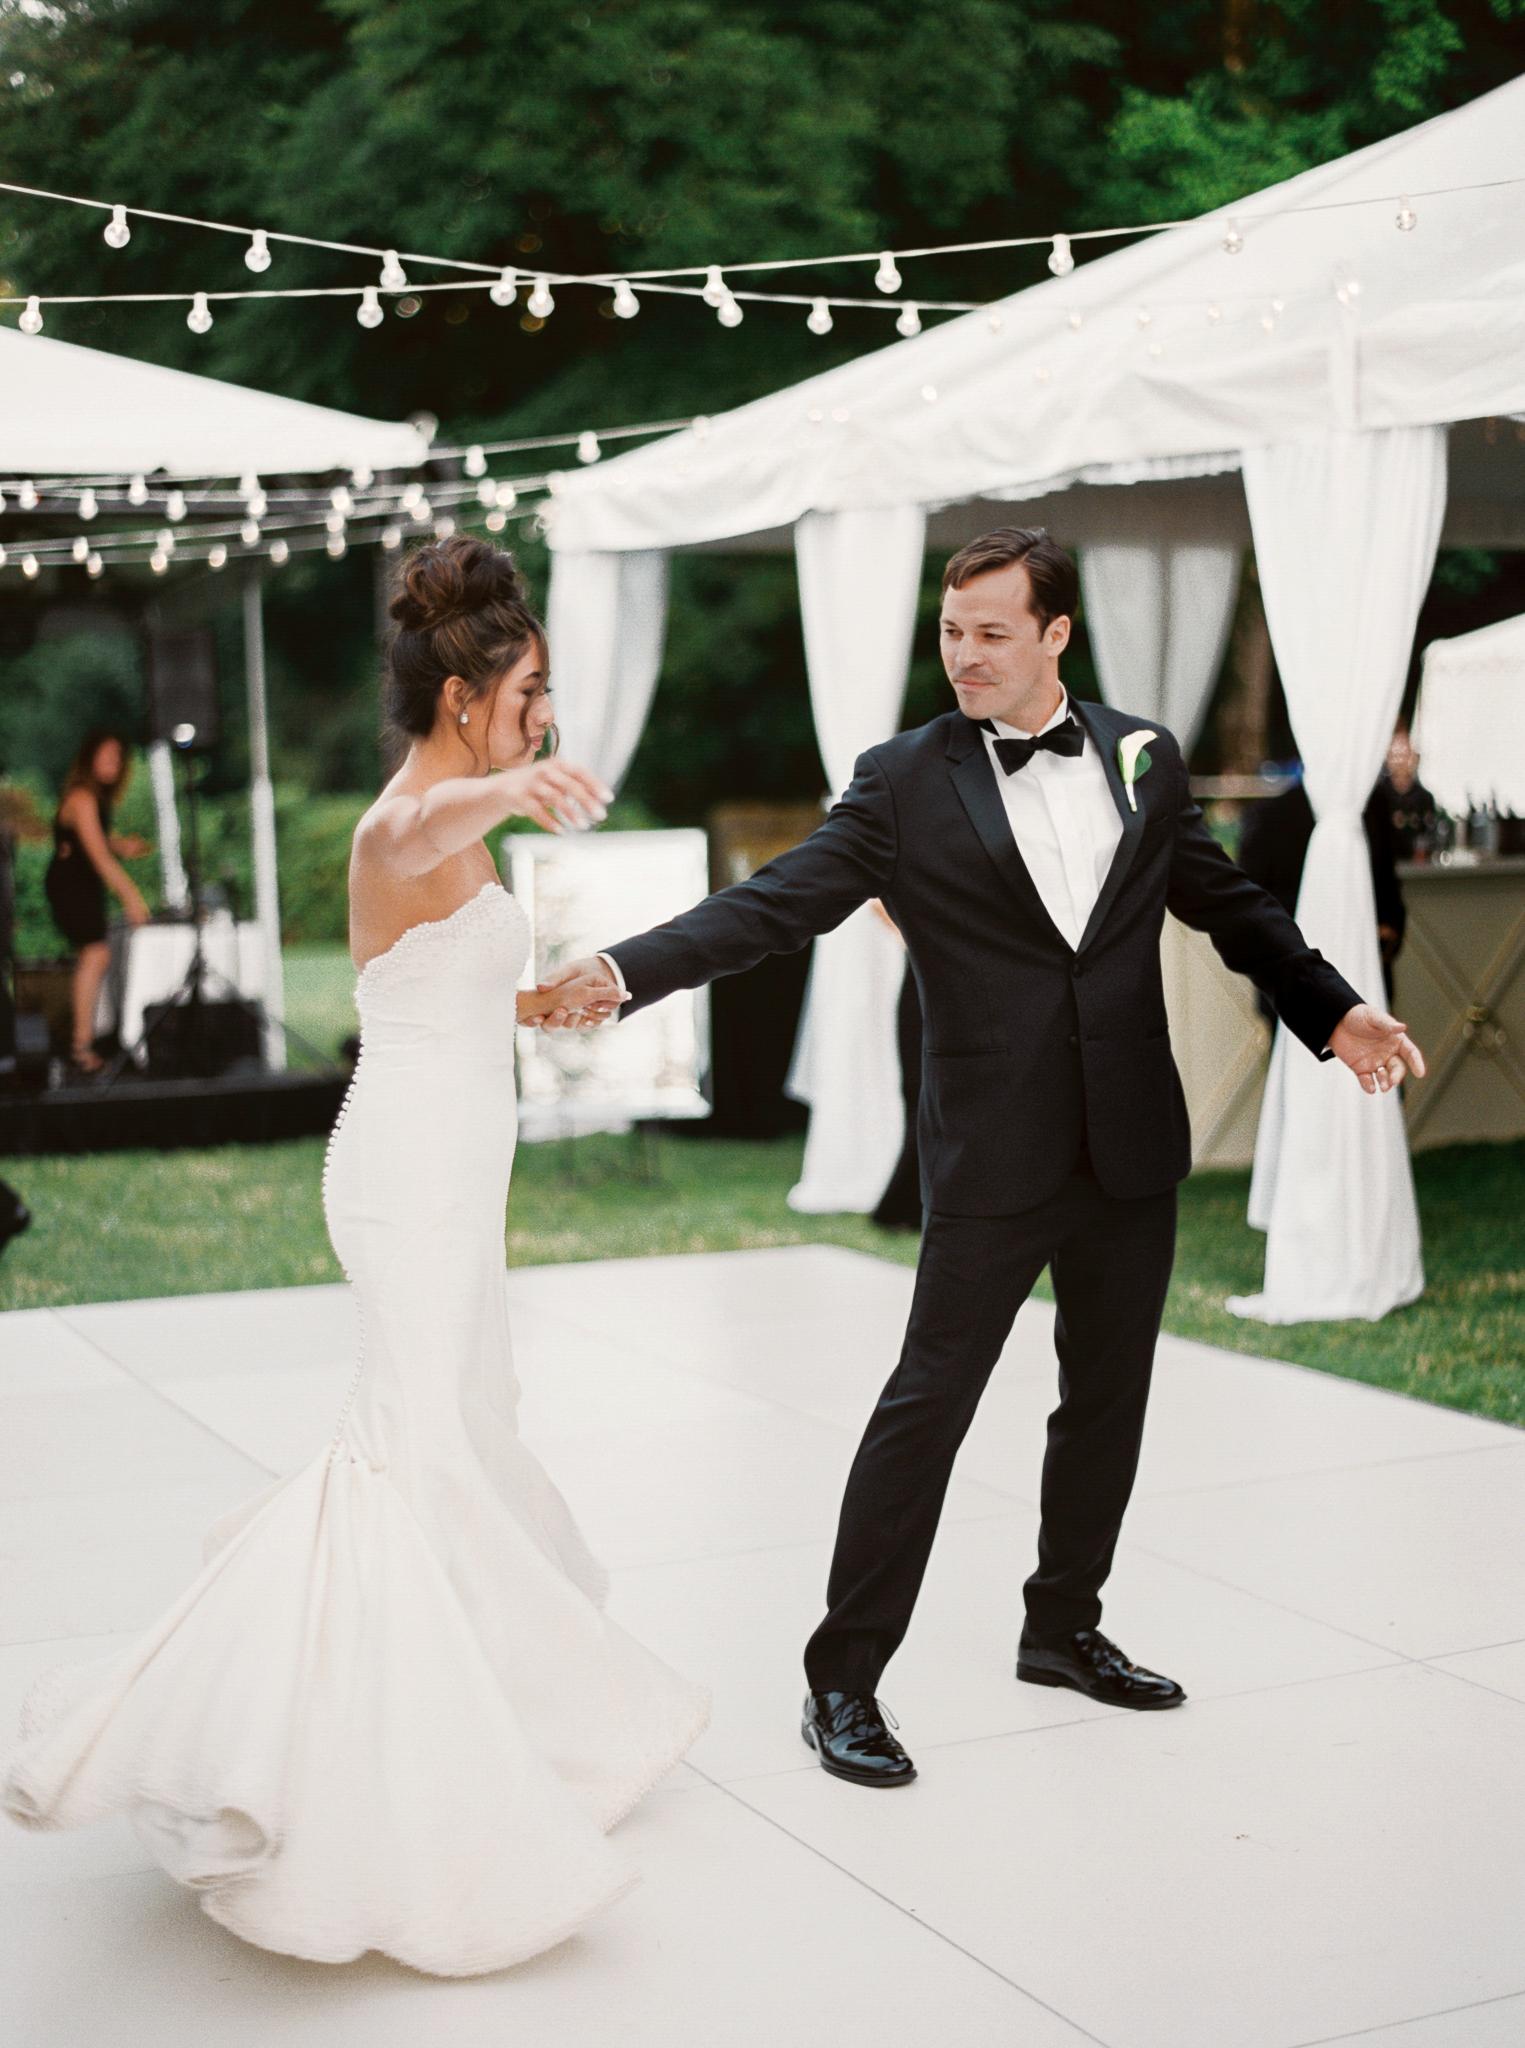 184OutliveCreative_Travel_Photographer_Videographer_Lewis&Clark_Oregon_Elegant_BlackTie_Destination_Wedding.jpg